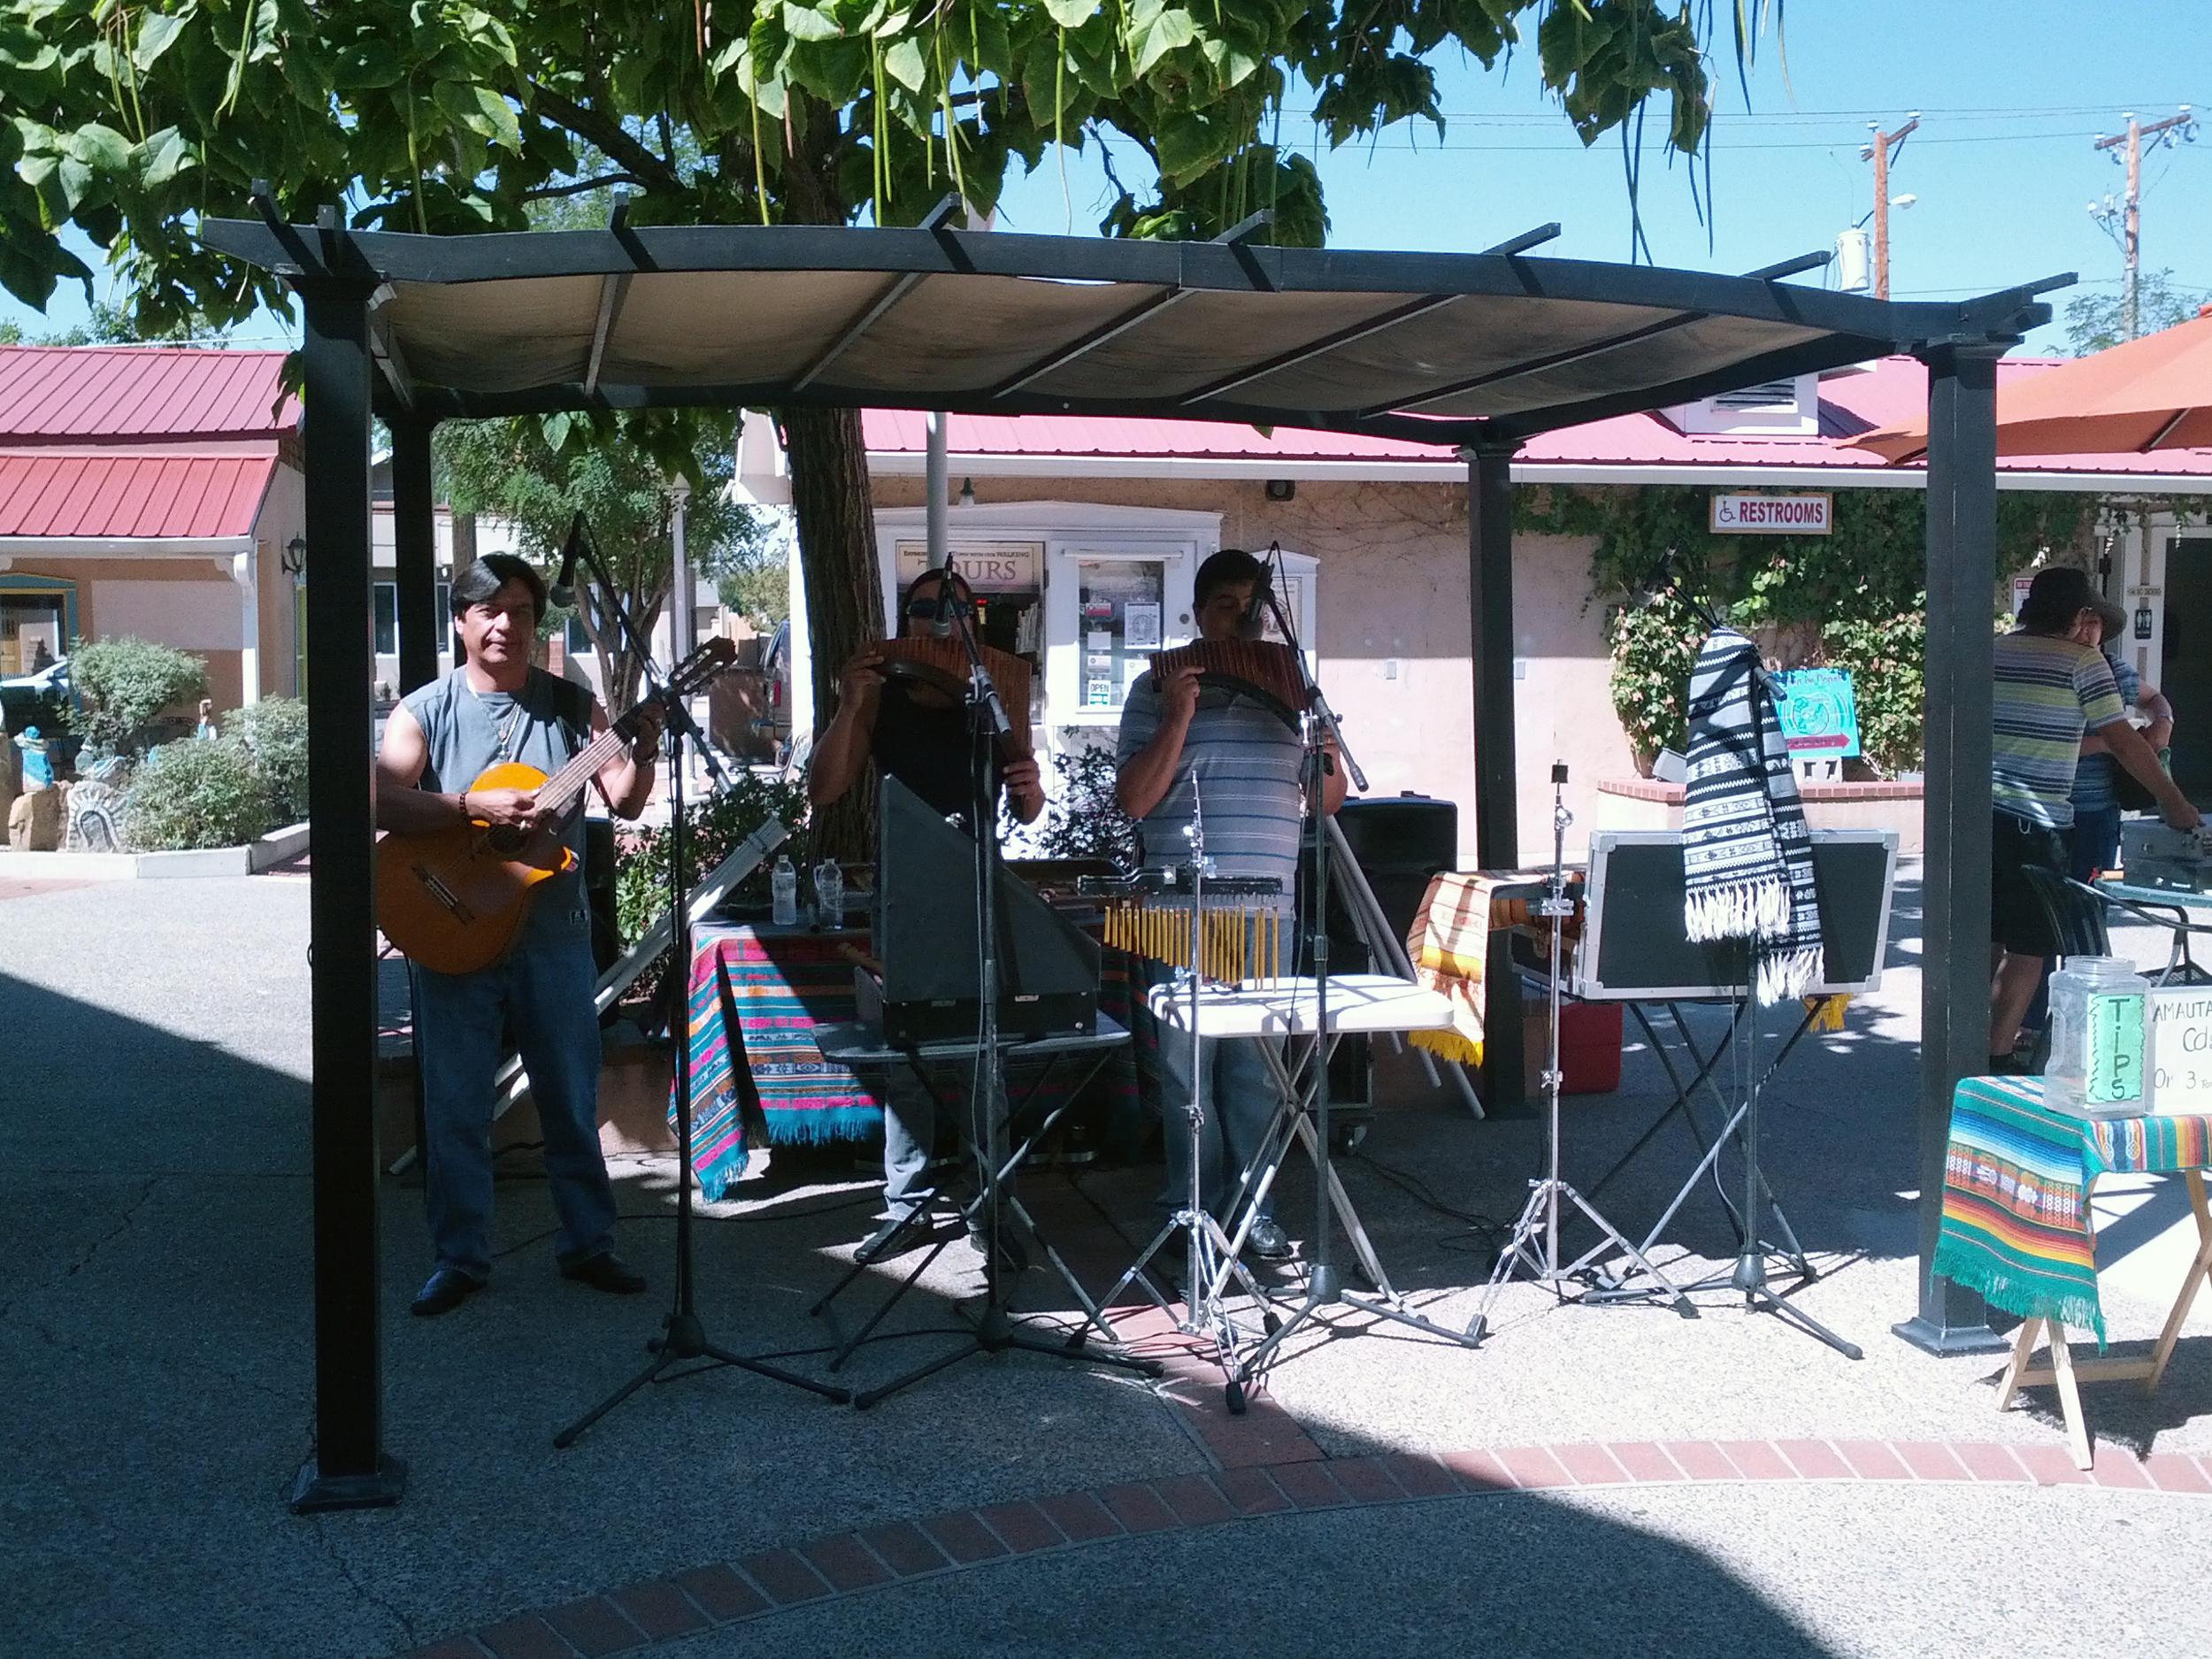 Amauta performing live, beautiful woodwind instruments